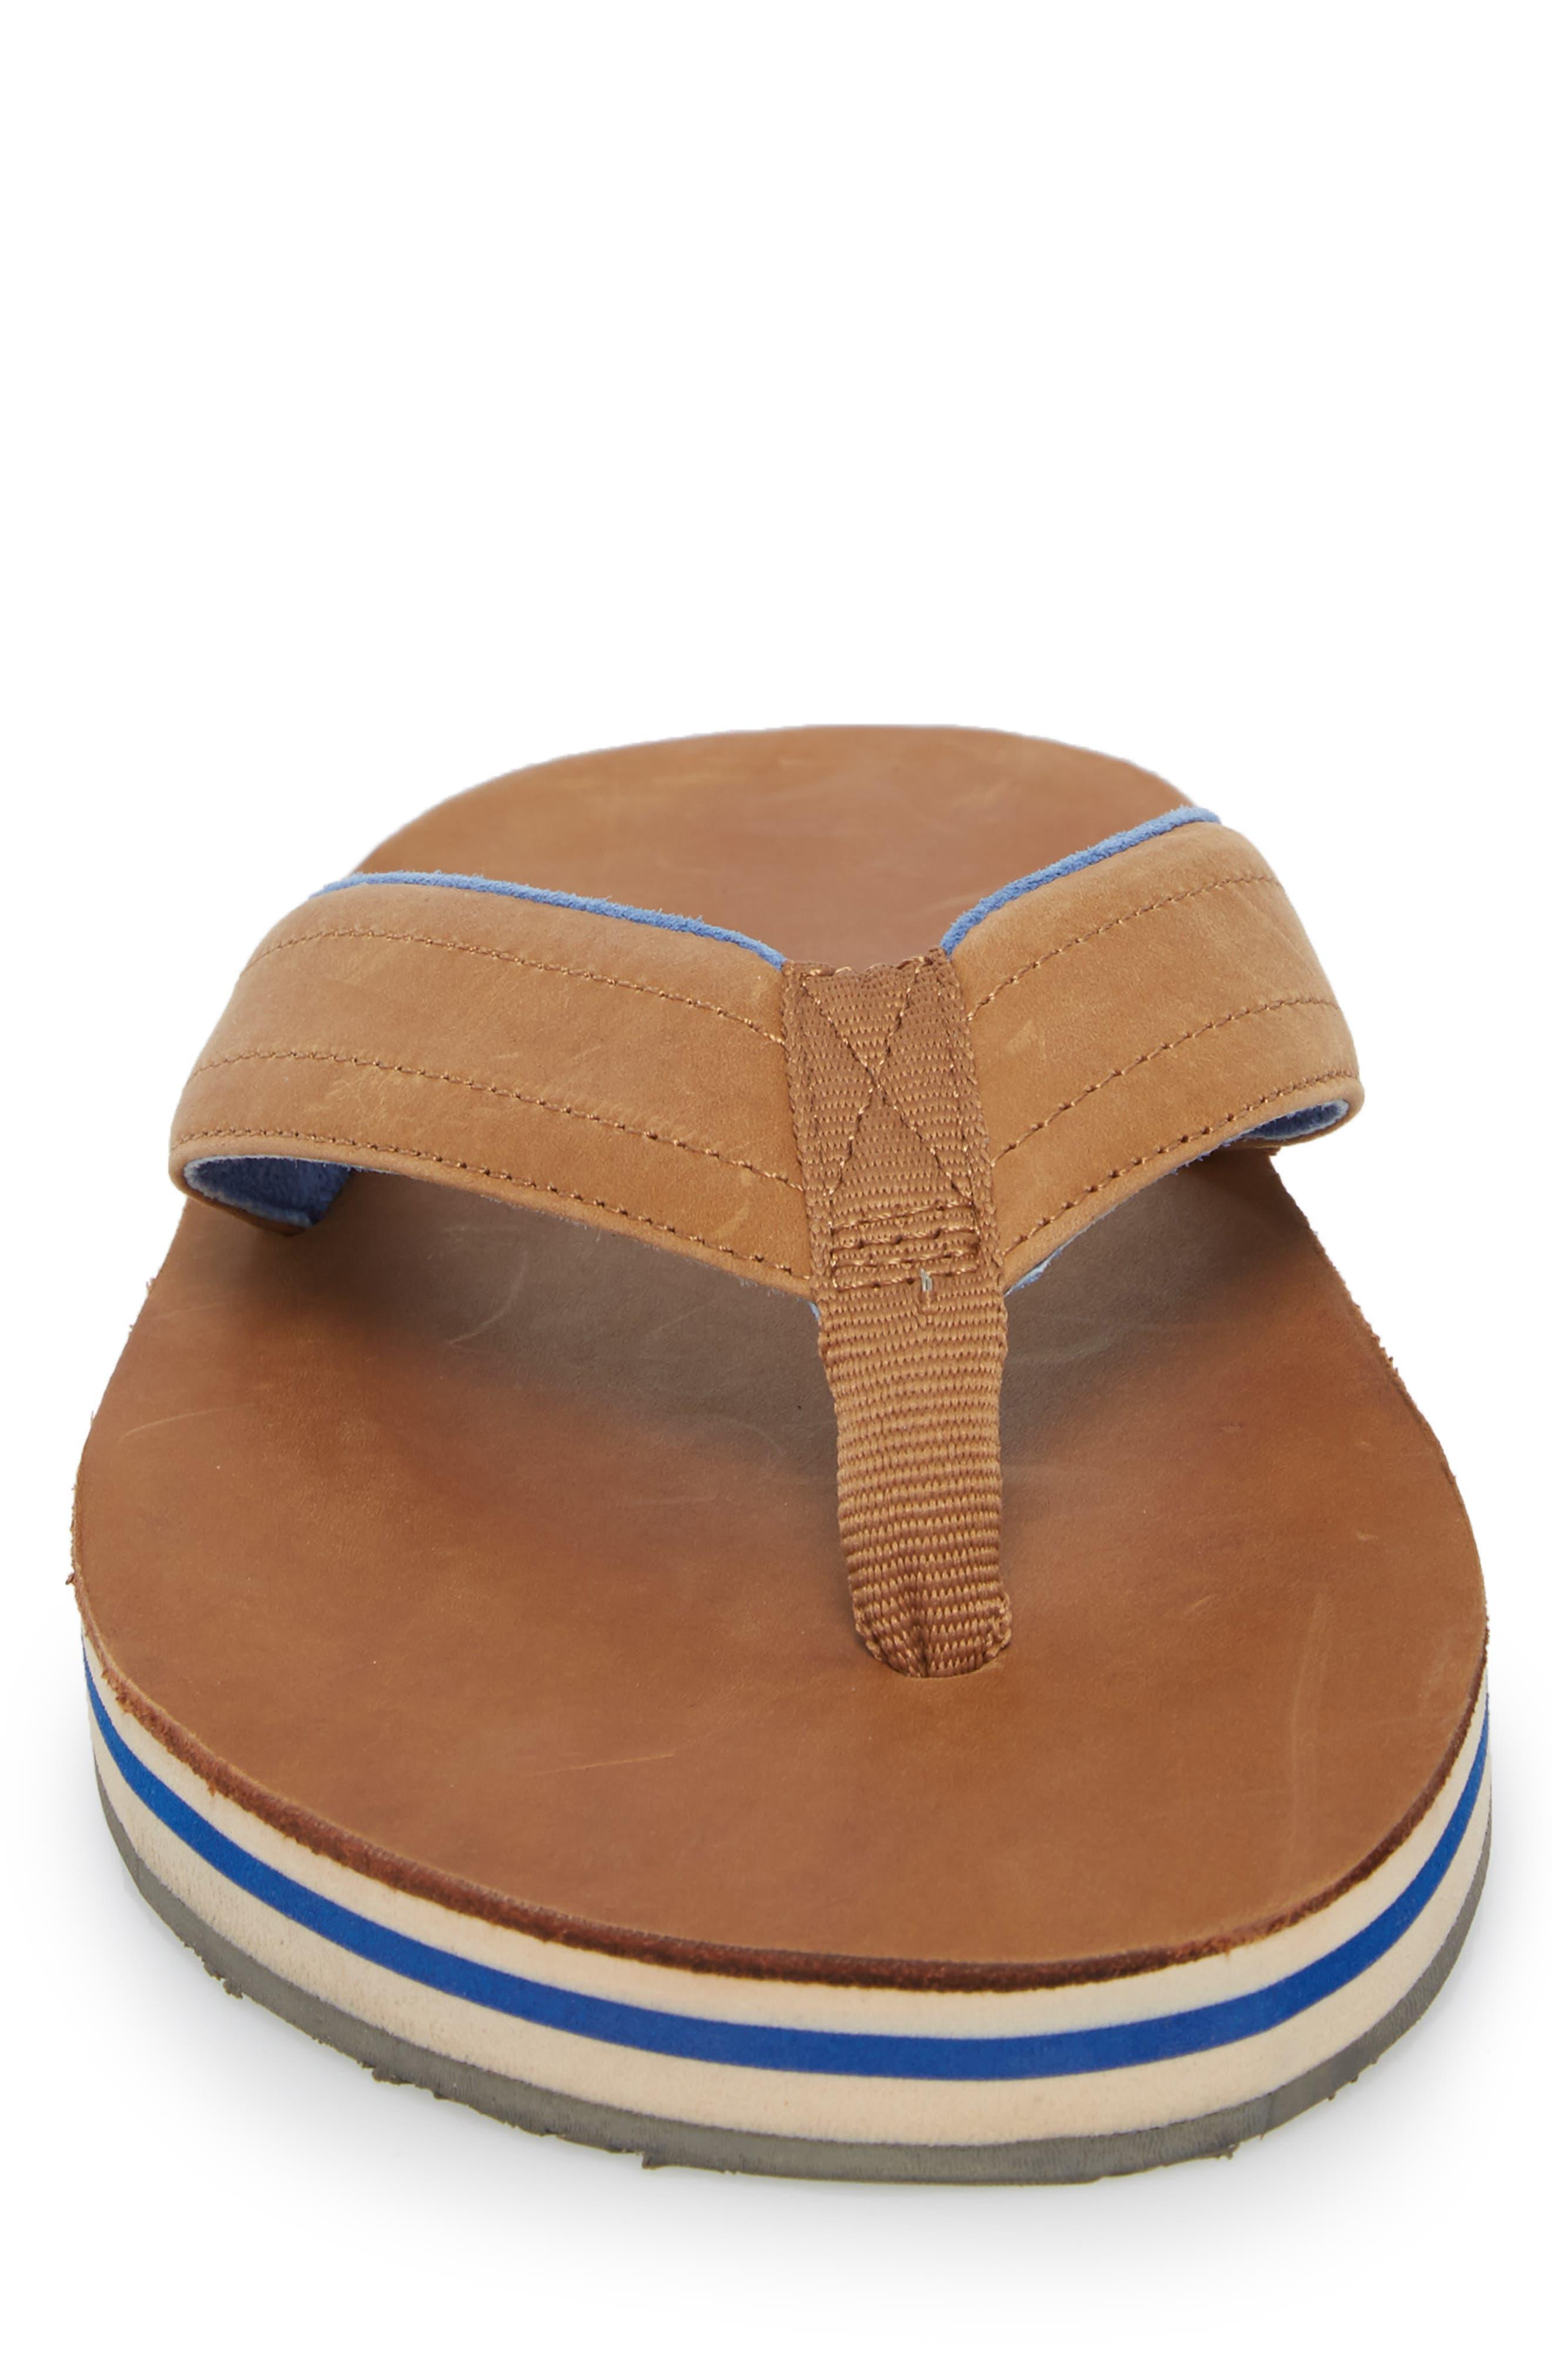 Lakes Sandwich Stripe Flip Flop,                             Alternate thumbnail 4, color,                             Tan/ Navy Leather